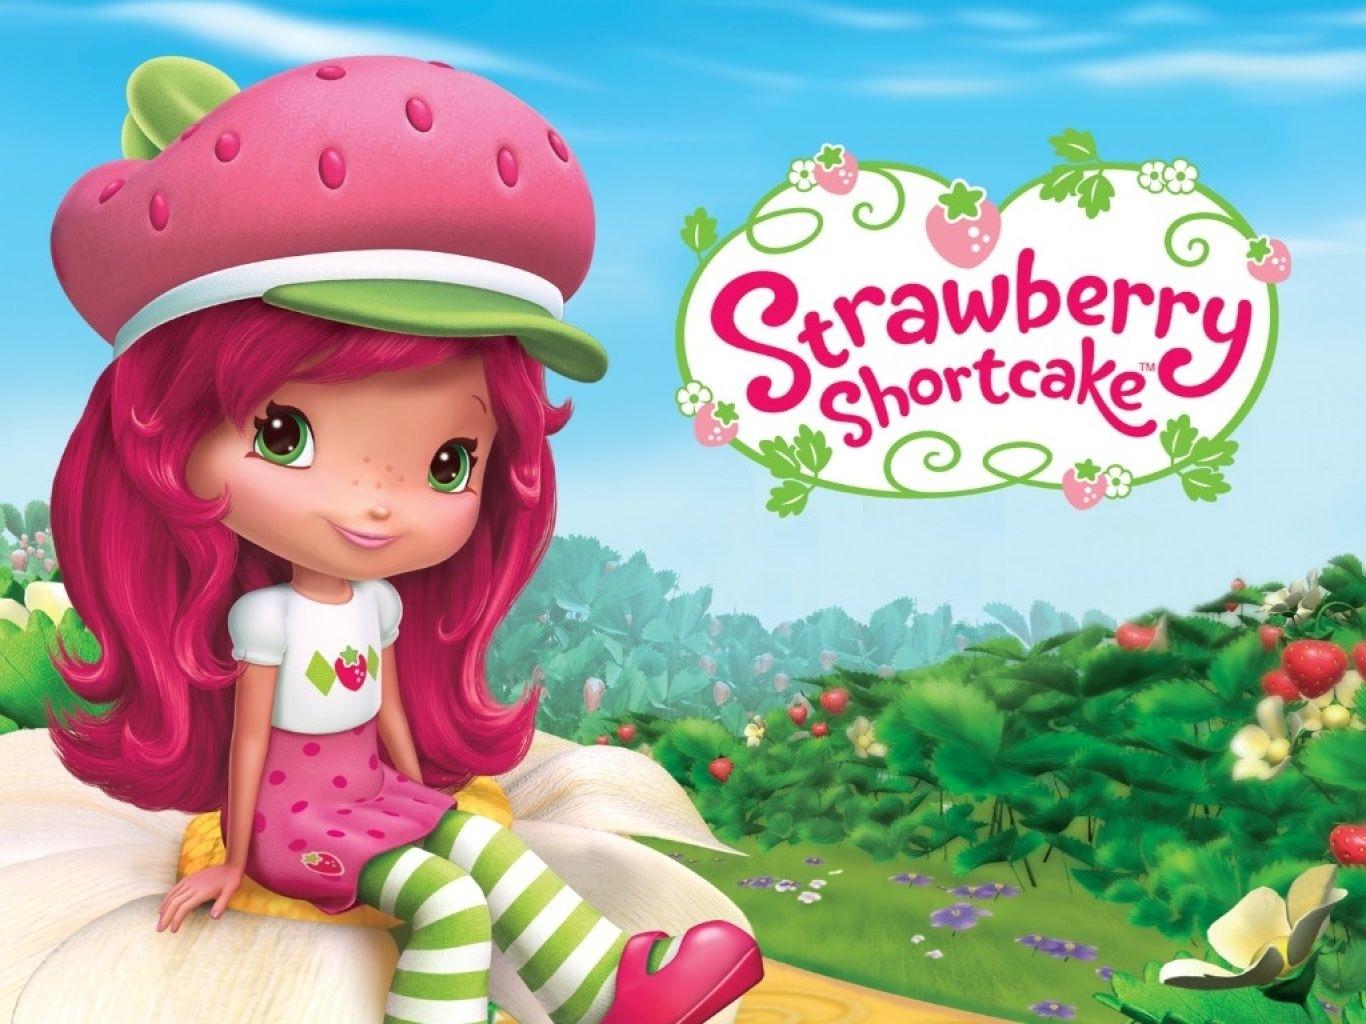 strawberry shortcake cute wallpapers for desktop cakepins | for